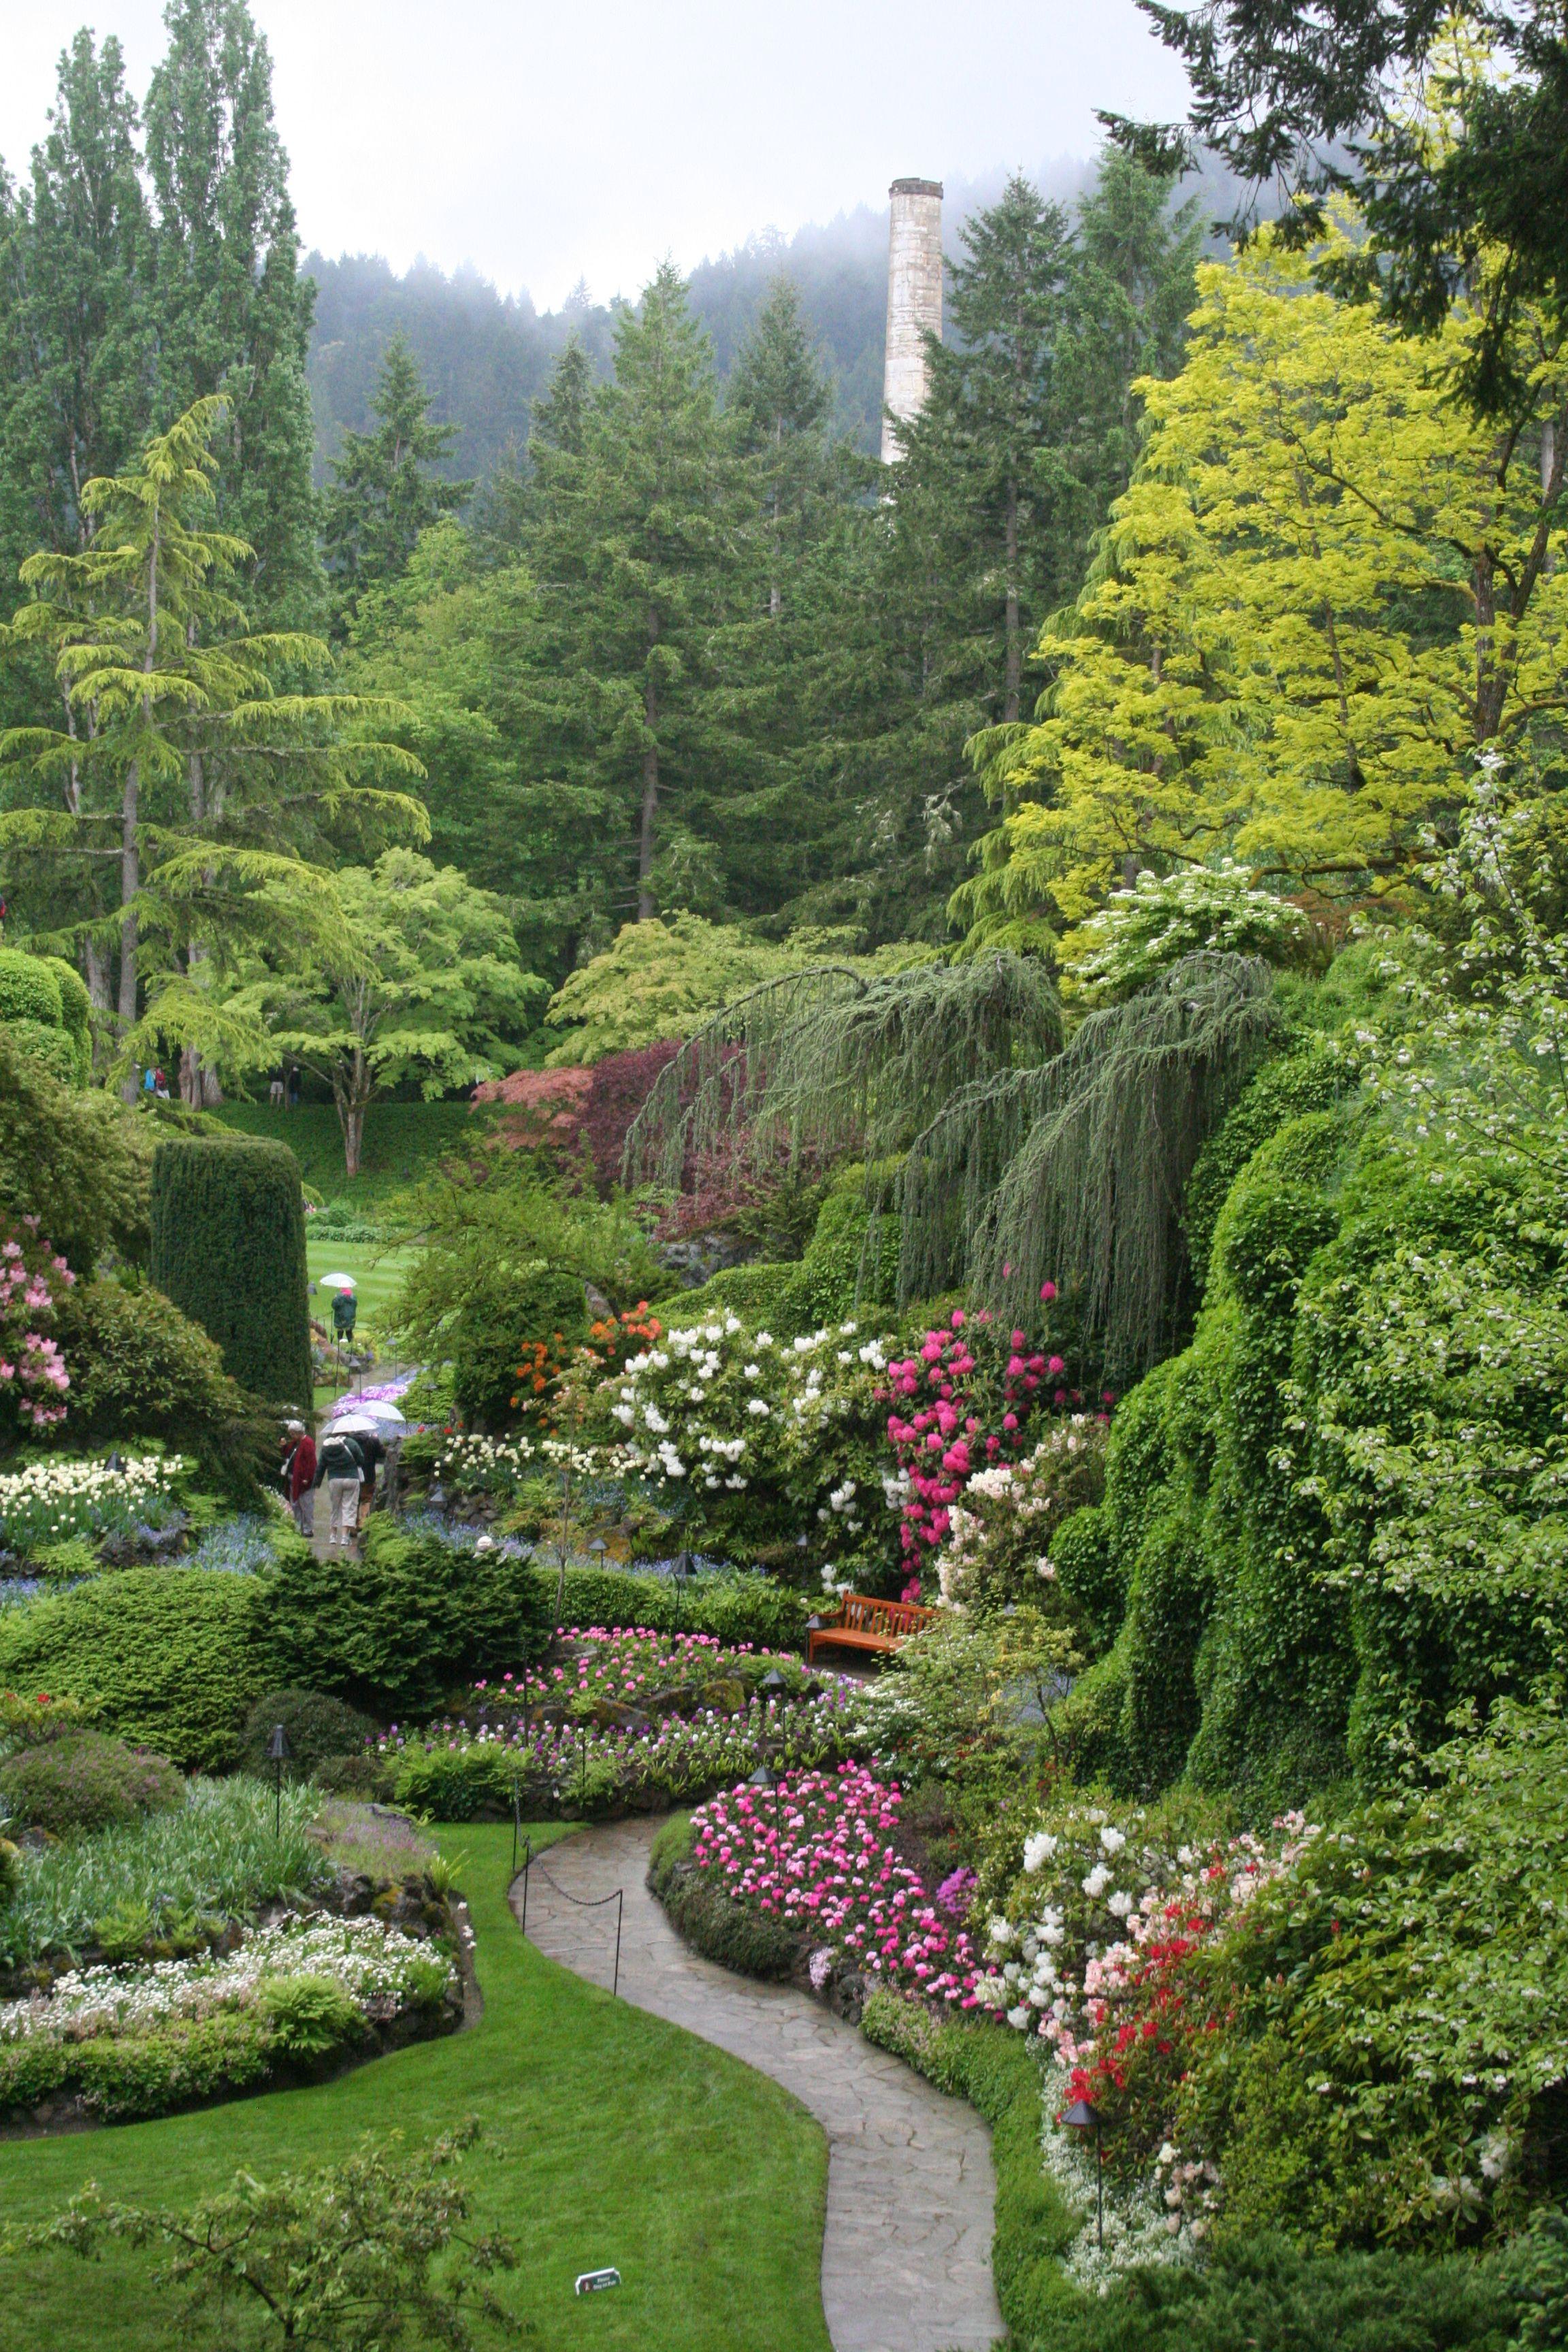 Buchart Gardens Canada By Patty Mcquiston 2013 In 400 x 300